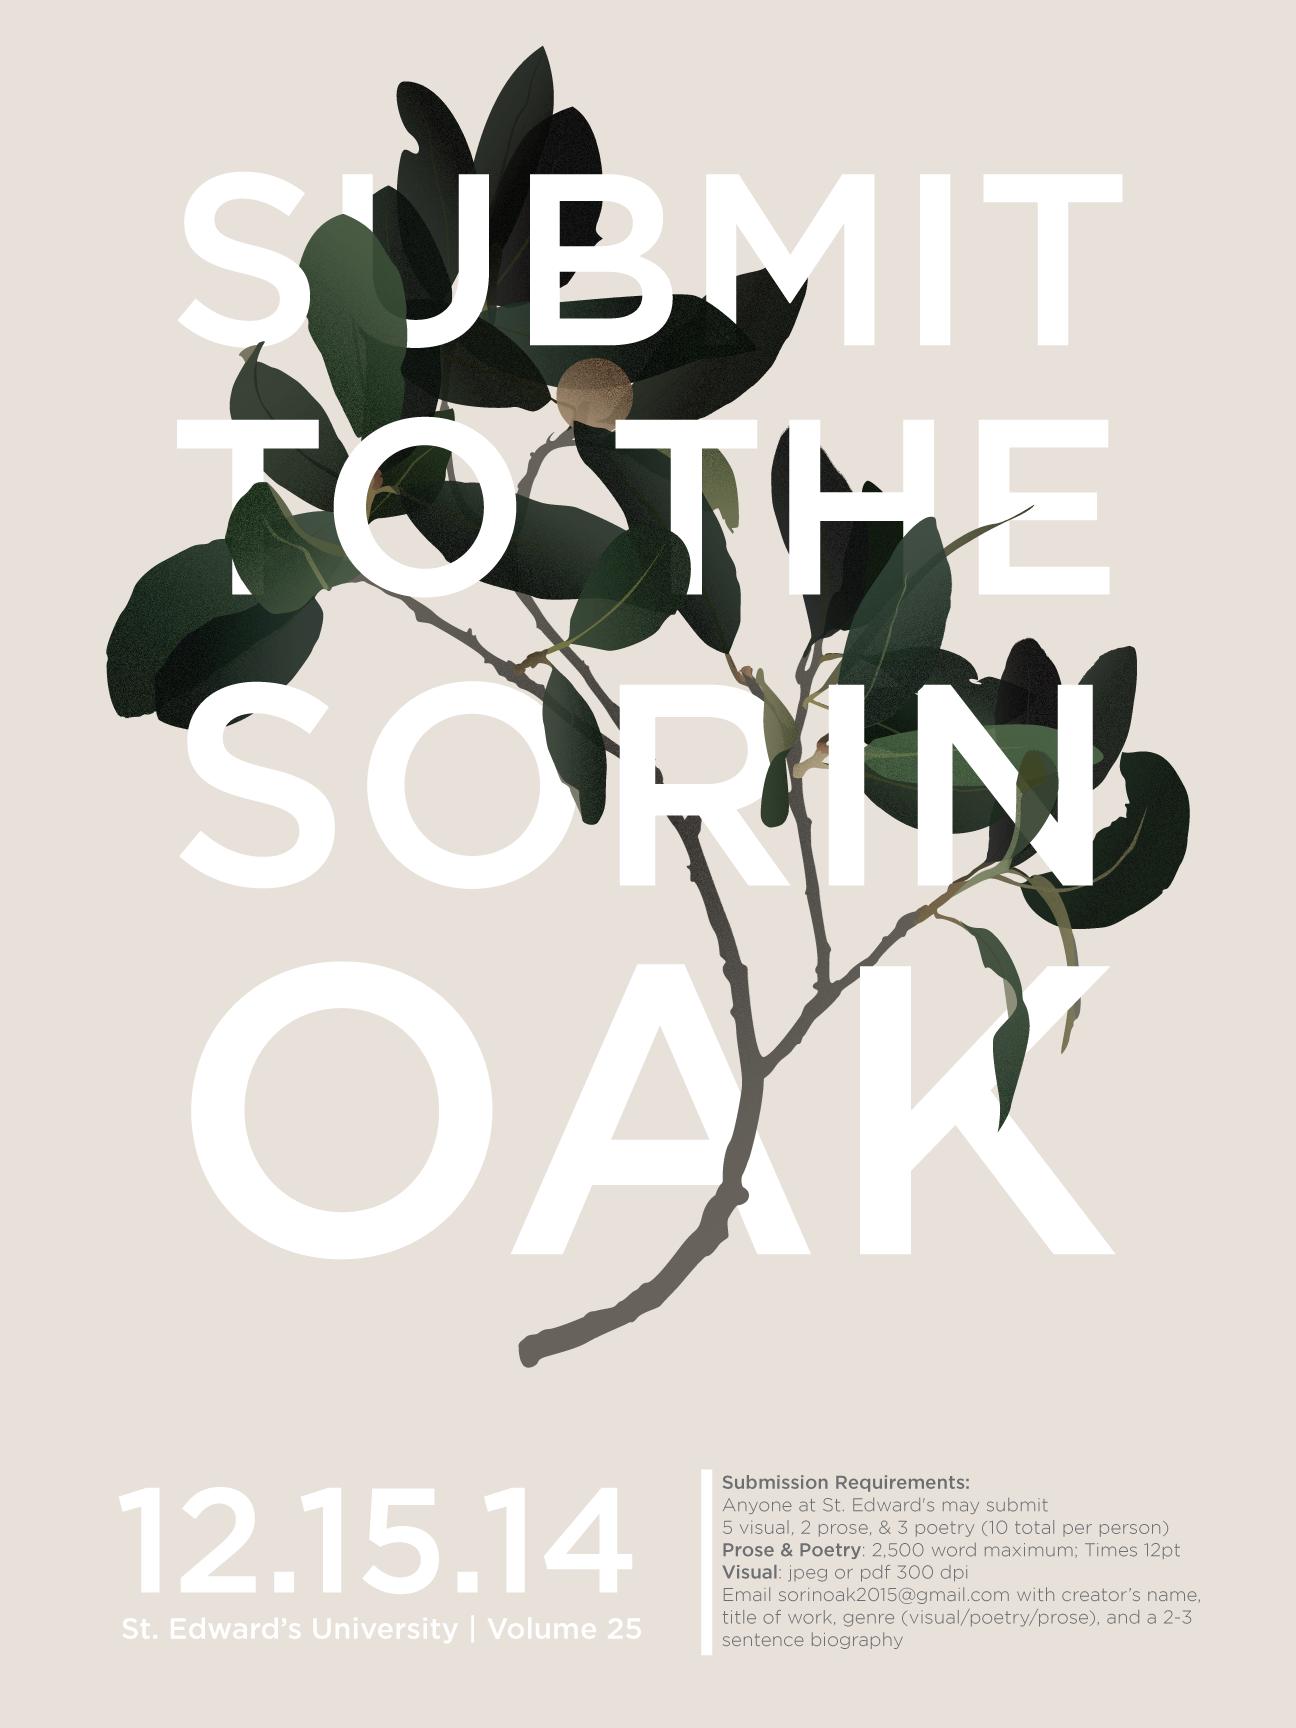 Sorin-Poster-Final.png